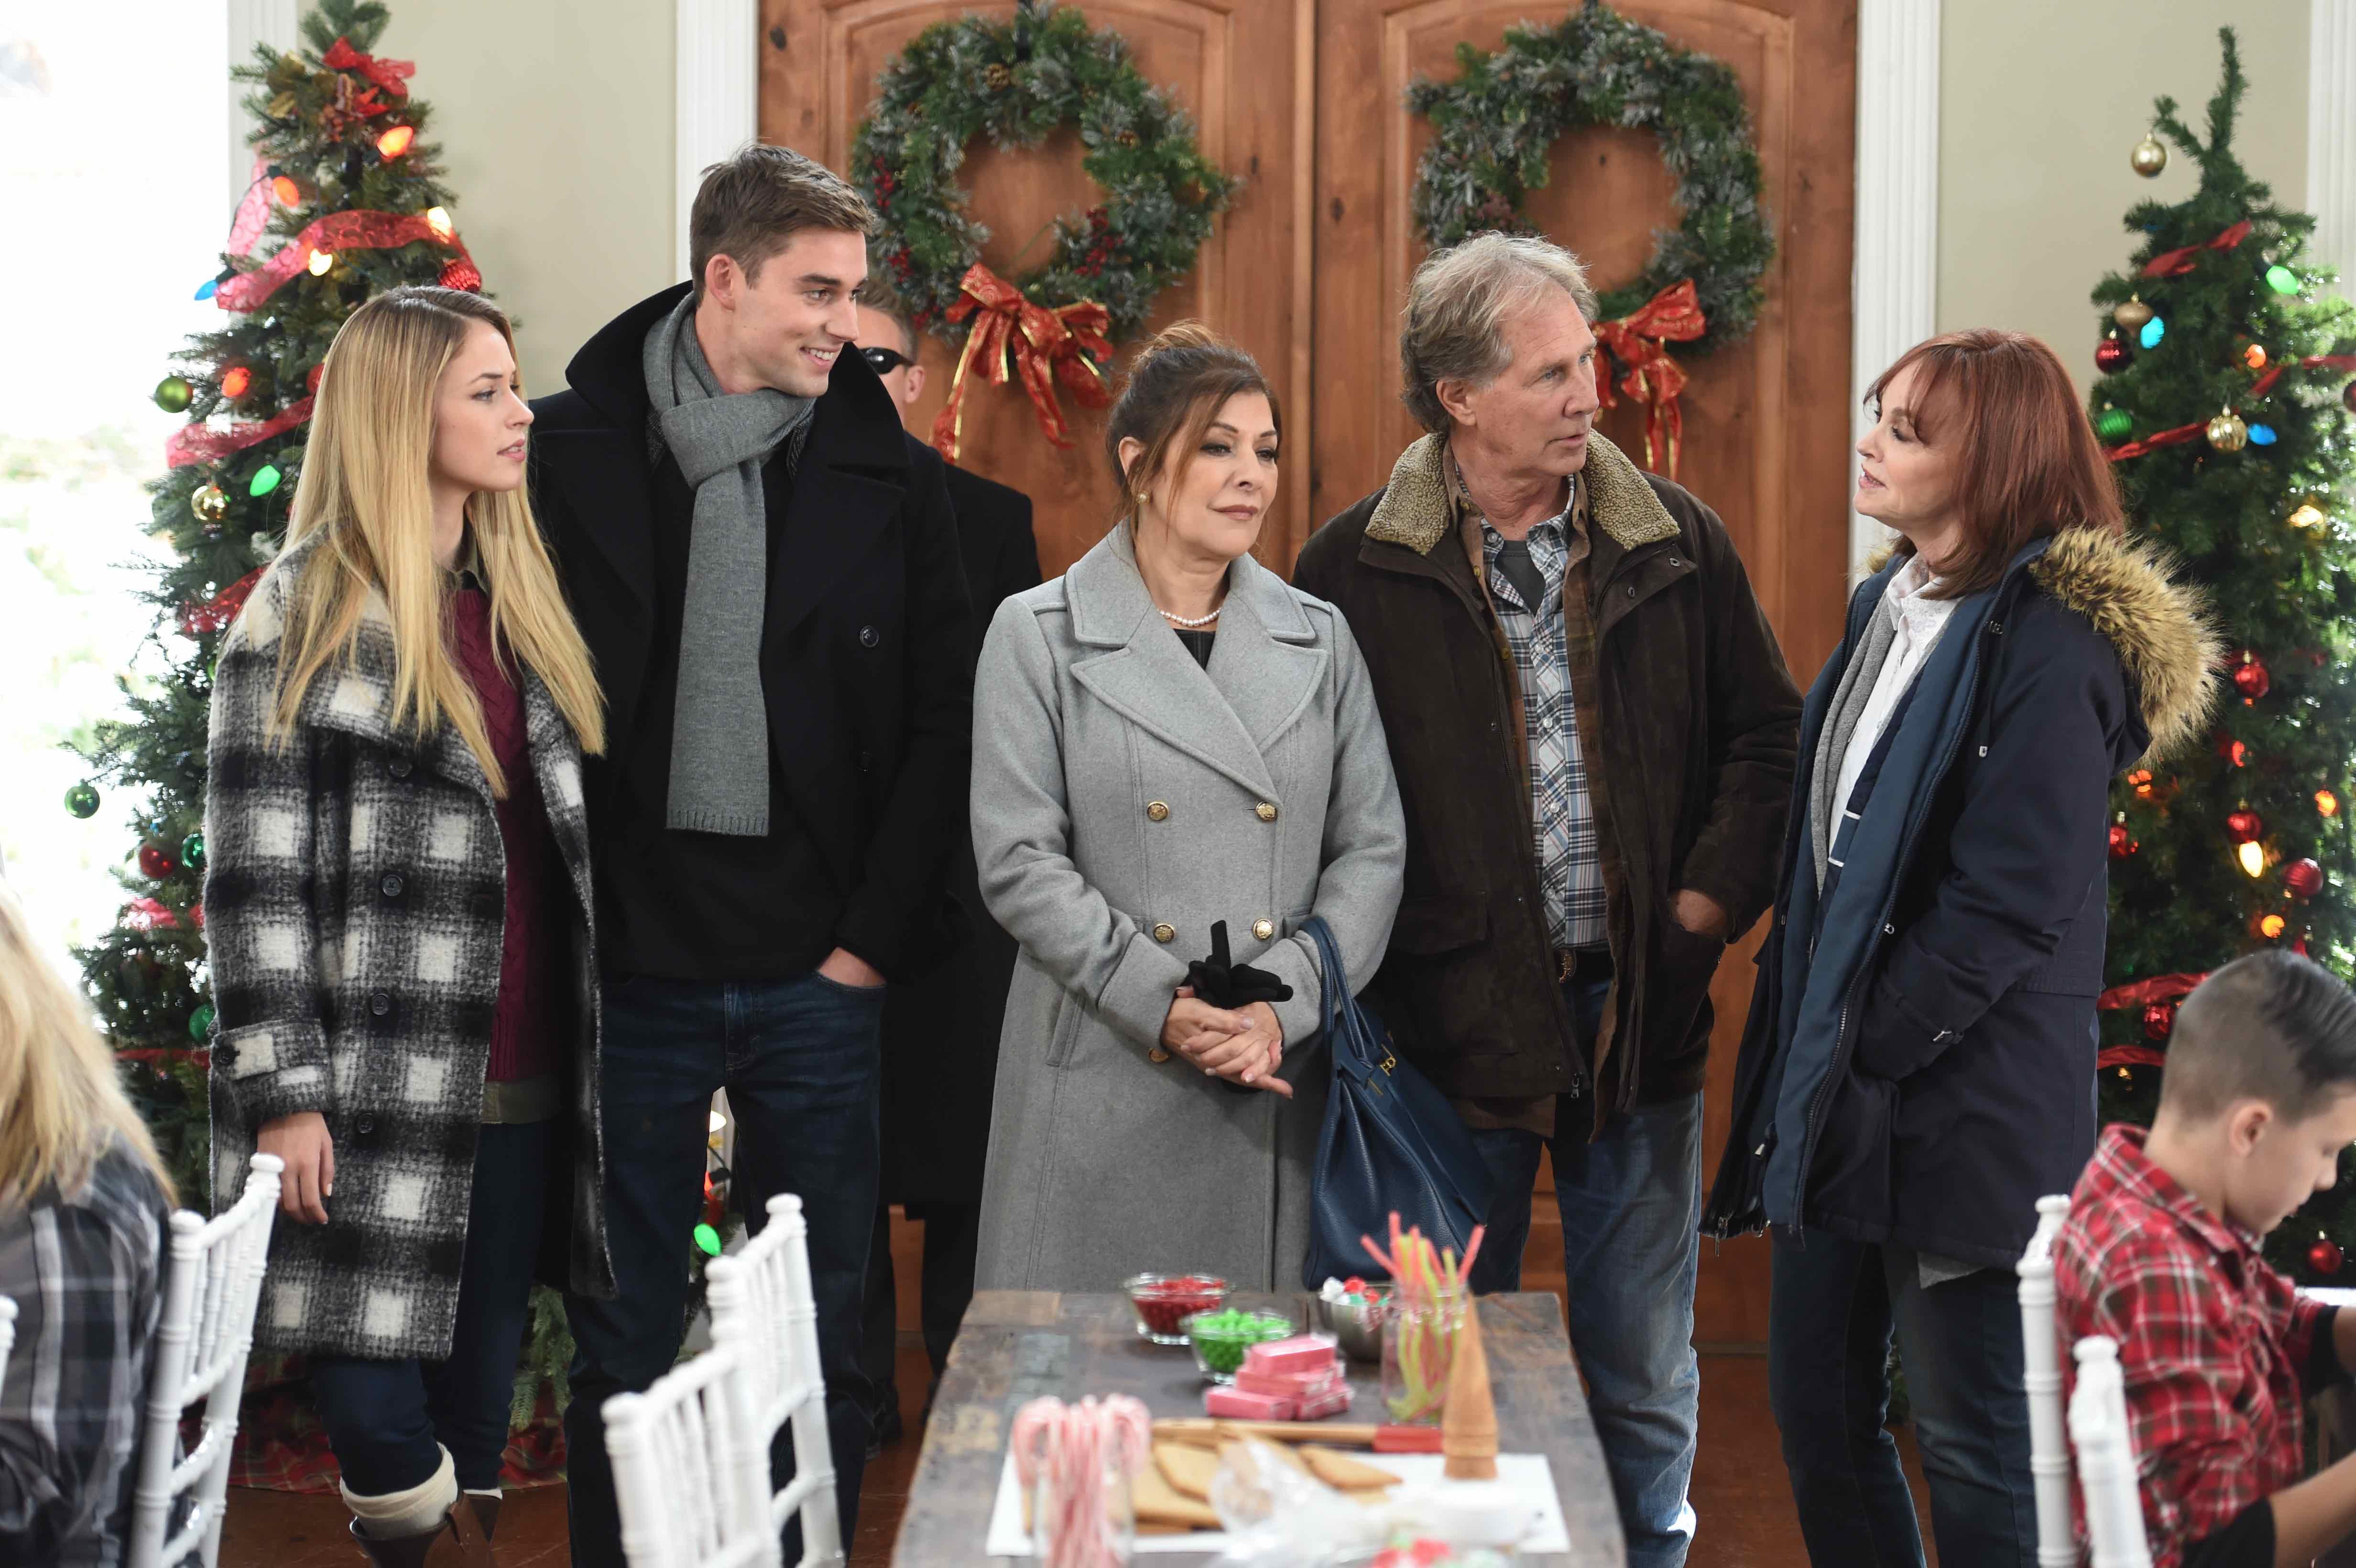 Marina Sirtis, Pamela Sue Martin, Parker Stevenson, Alexis Knapp, and Callum Alexander in My Christmas Prince (2017)